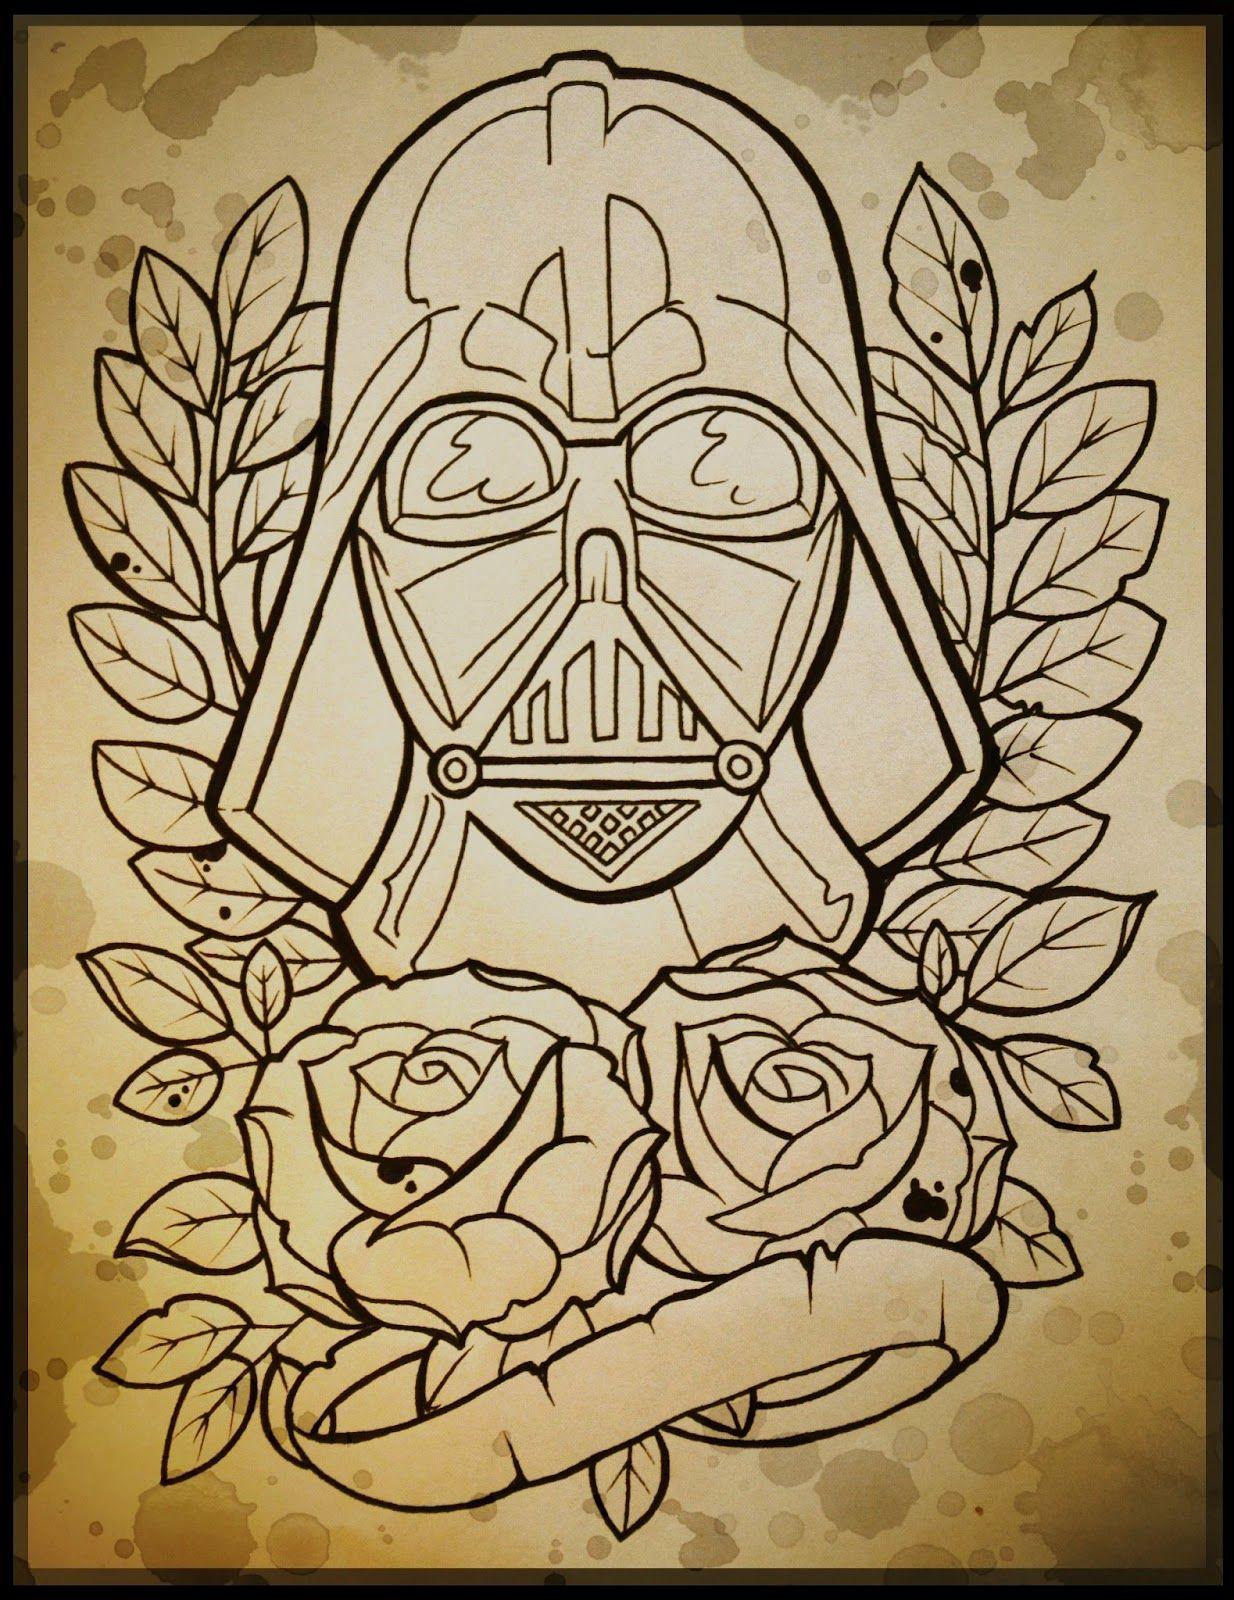 Bocetos De Tatuajes Tradicionales honor thy father | bocetos, tatuajes tradicionales y dibujos